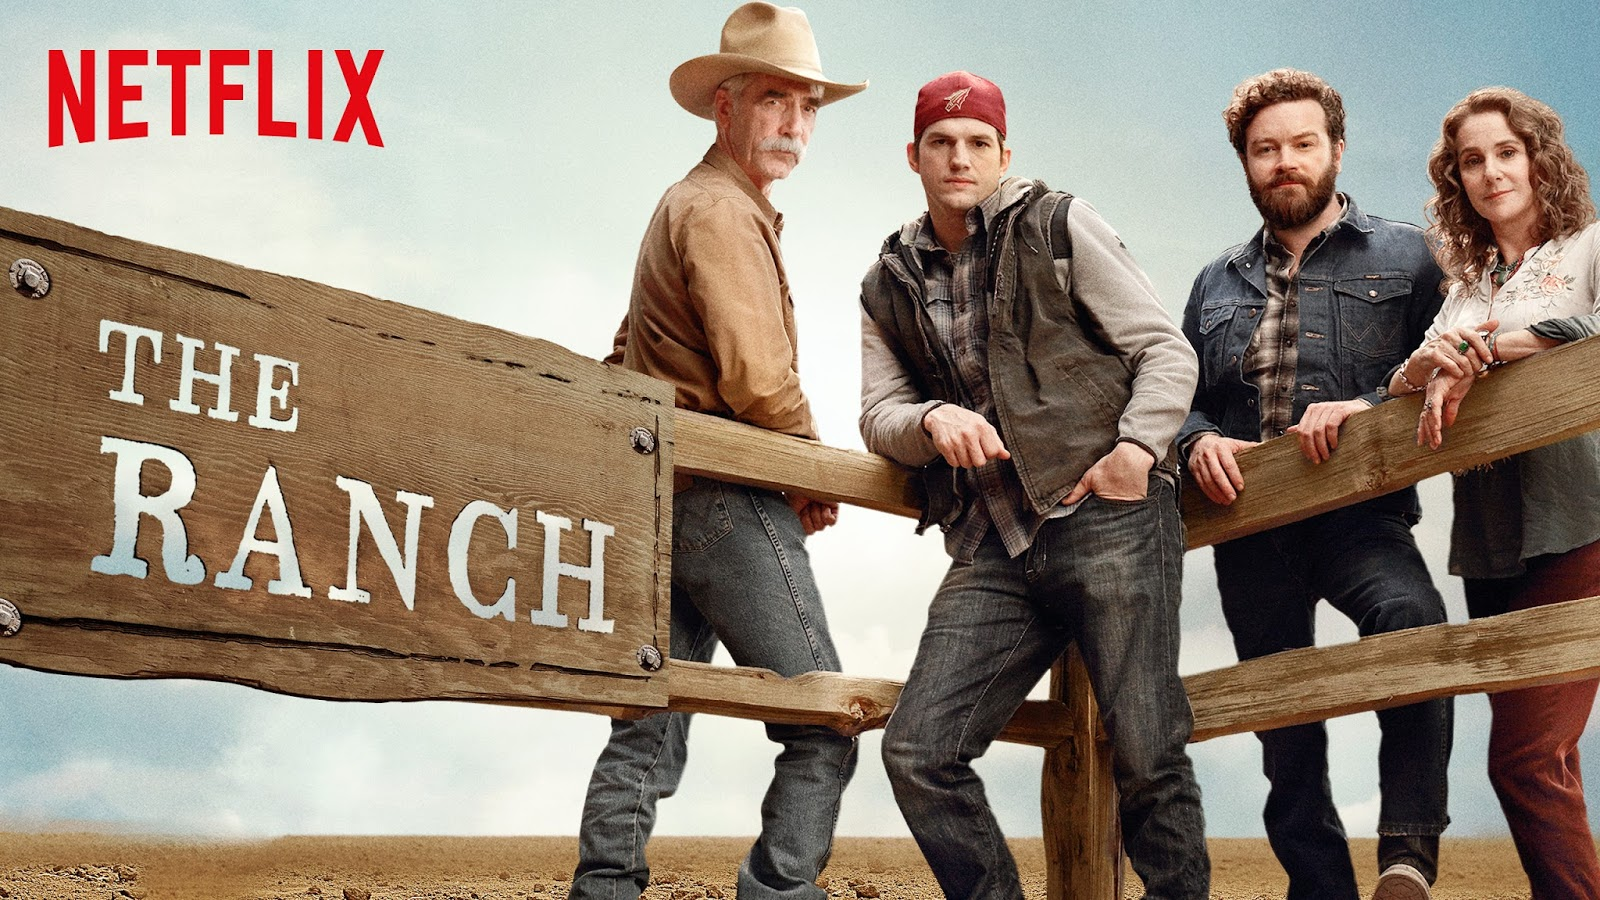 The Ranch, temporada 1 (disponible a partir de 01/04/2016)